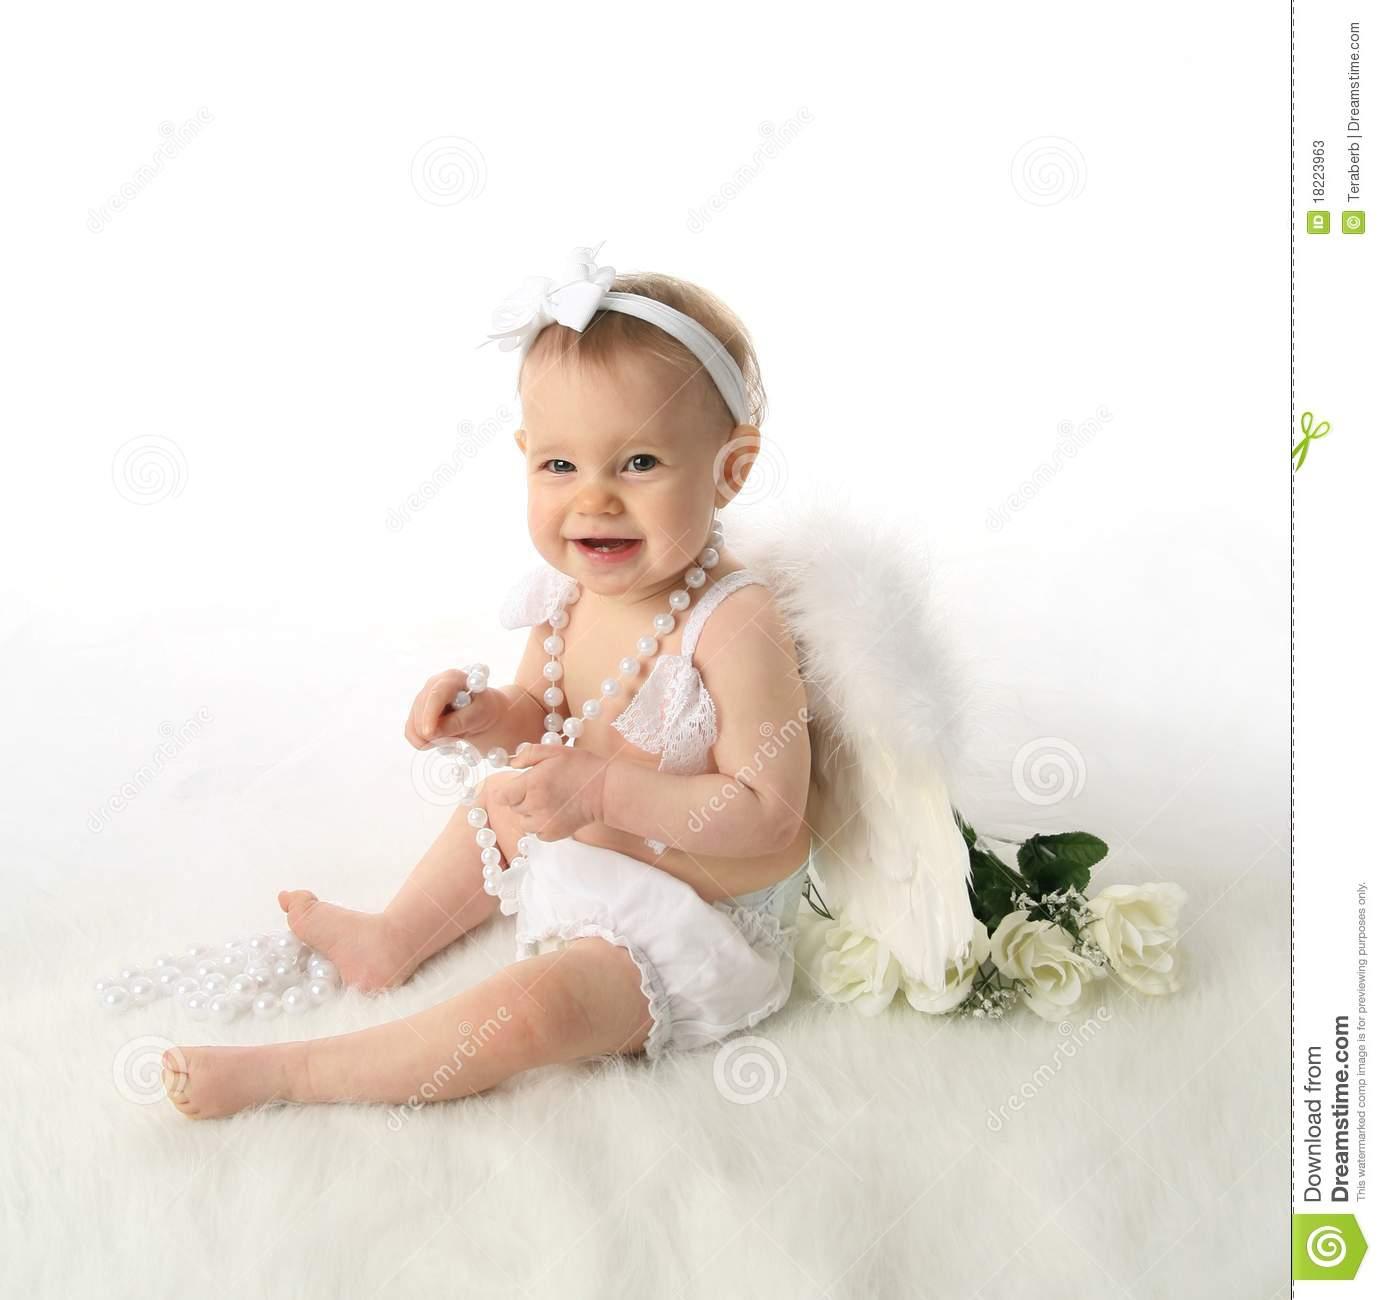 girl cute baby angel - photo #19